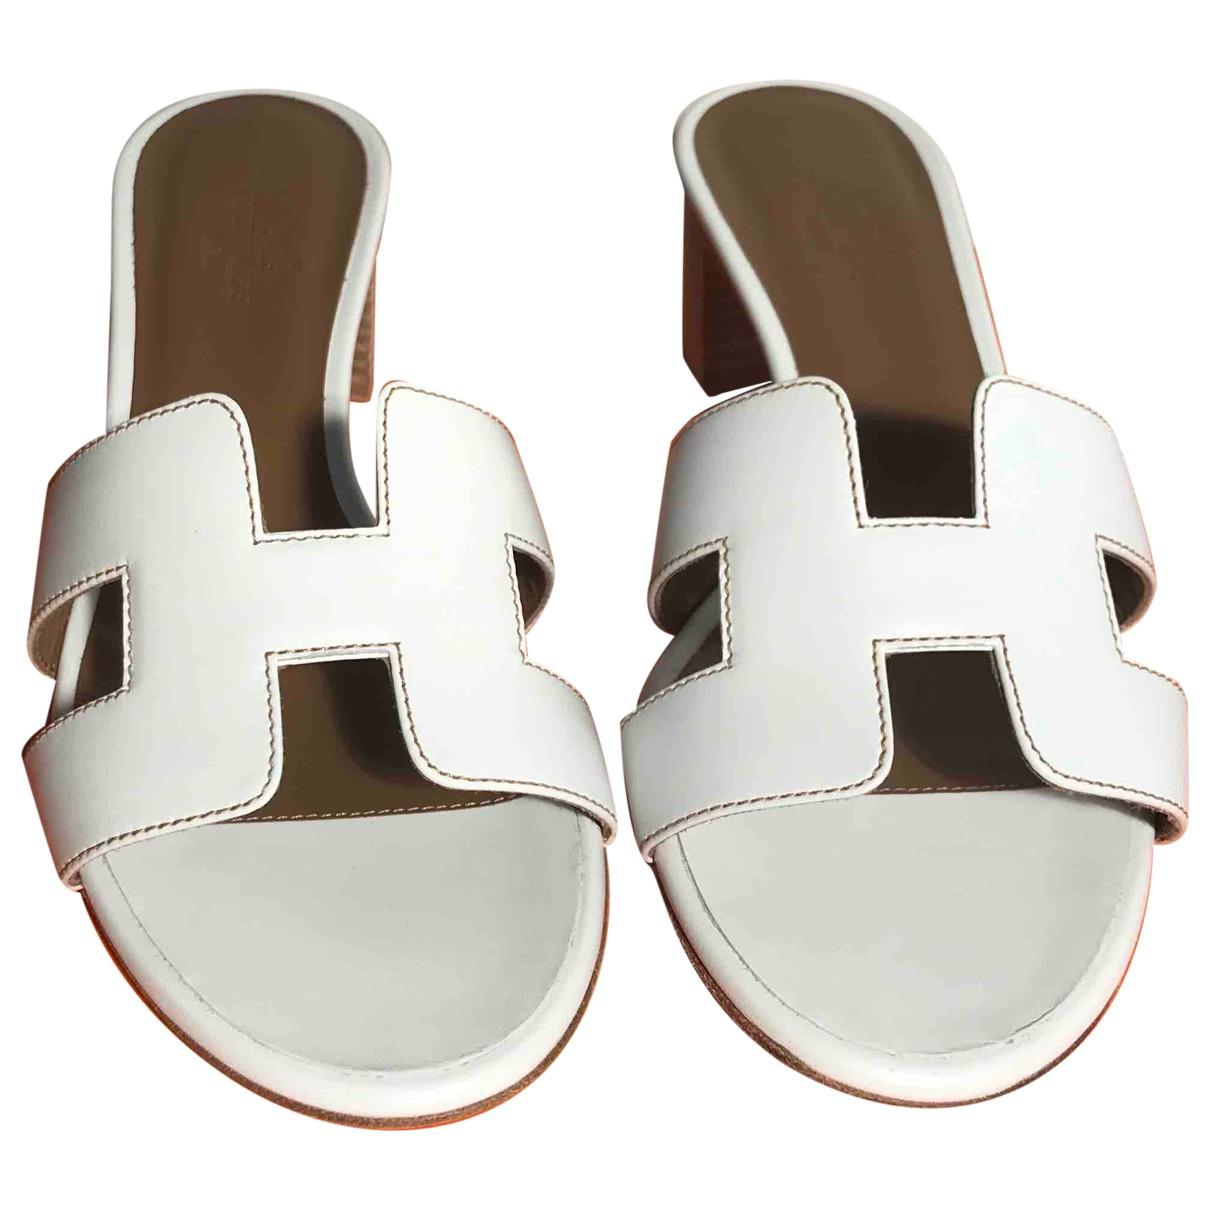 Hermes - Sandales Oasis pour femme en cuir - blanc